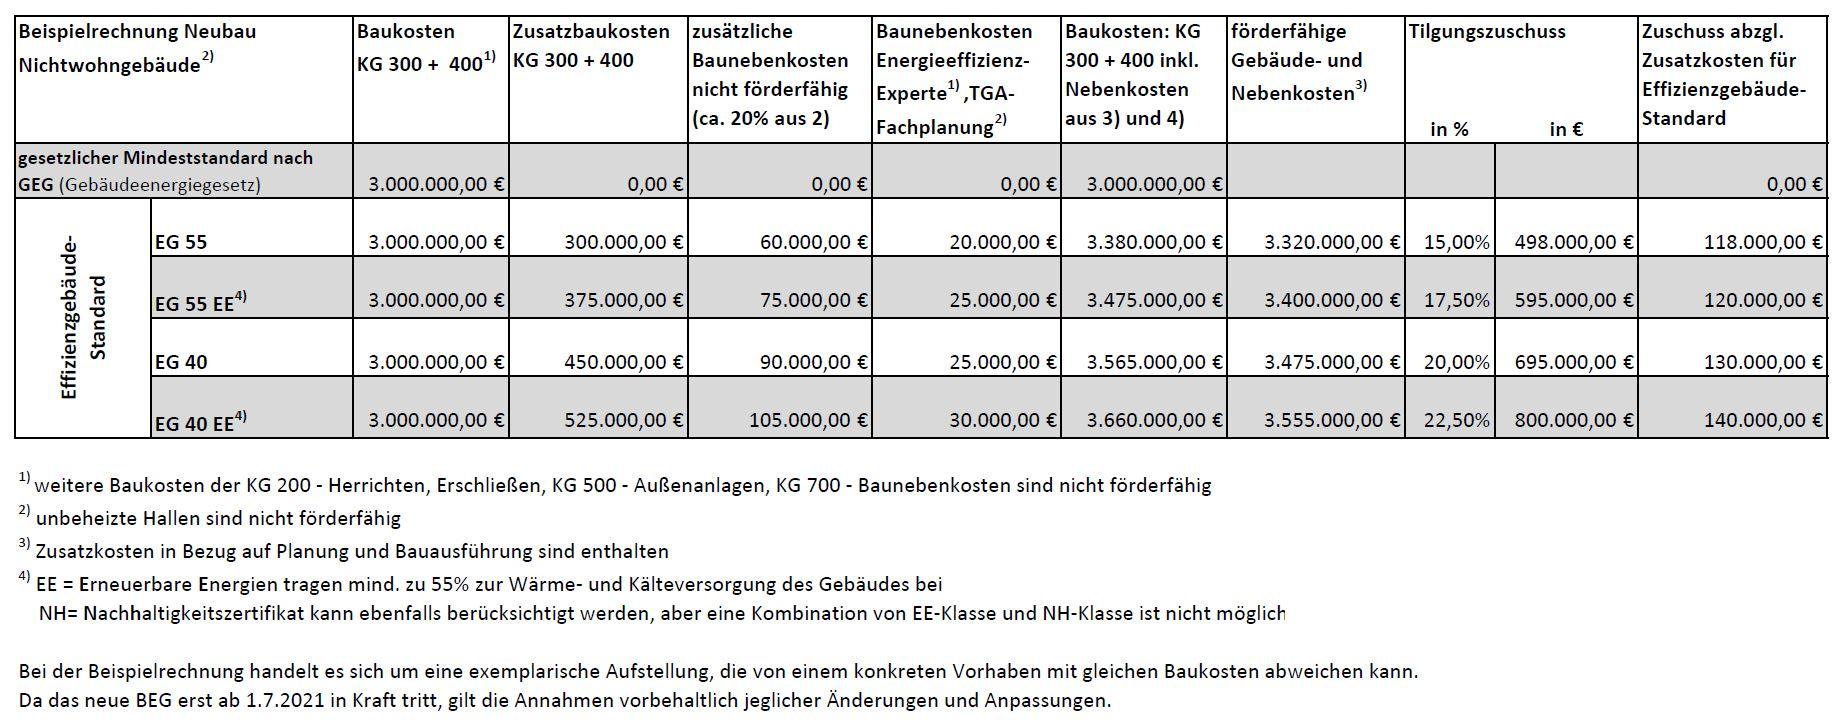 Bundesbauförderung Tabelle BEG